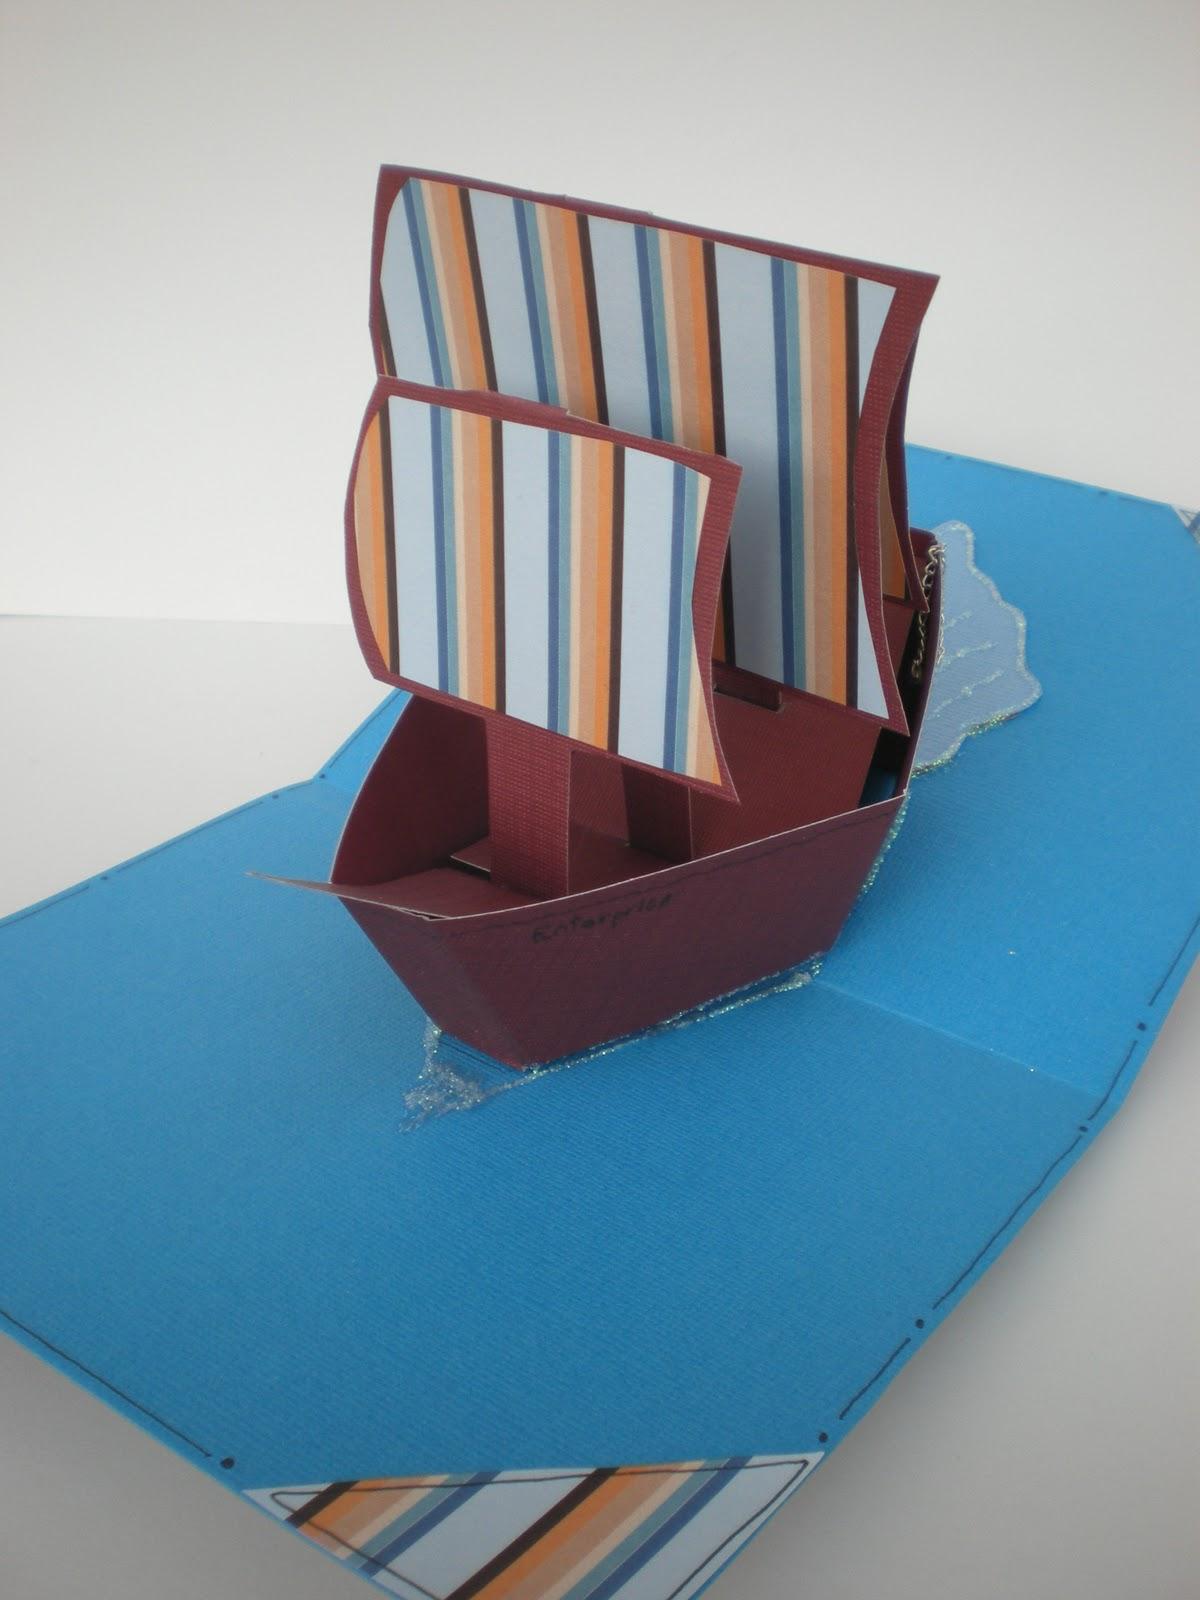 Boot bastelvorlage  Handmade by Bianca: Pop up Grußkarte, extra Spezial - Segelschiff